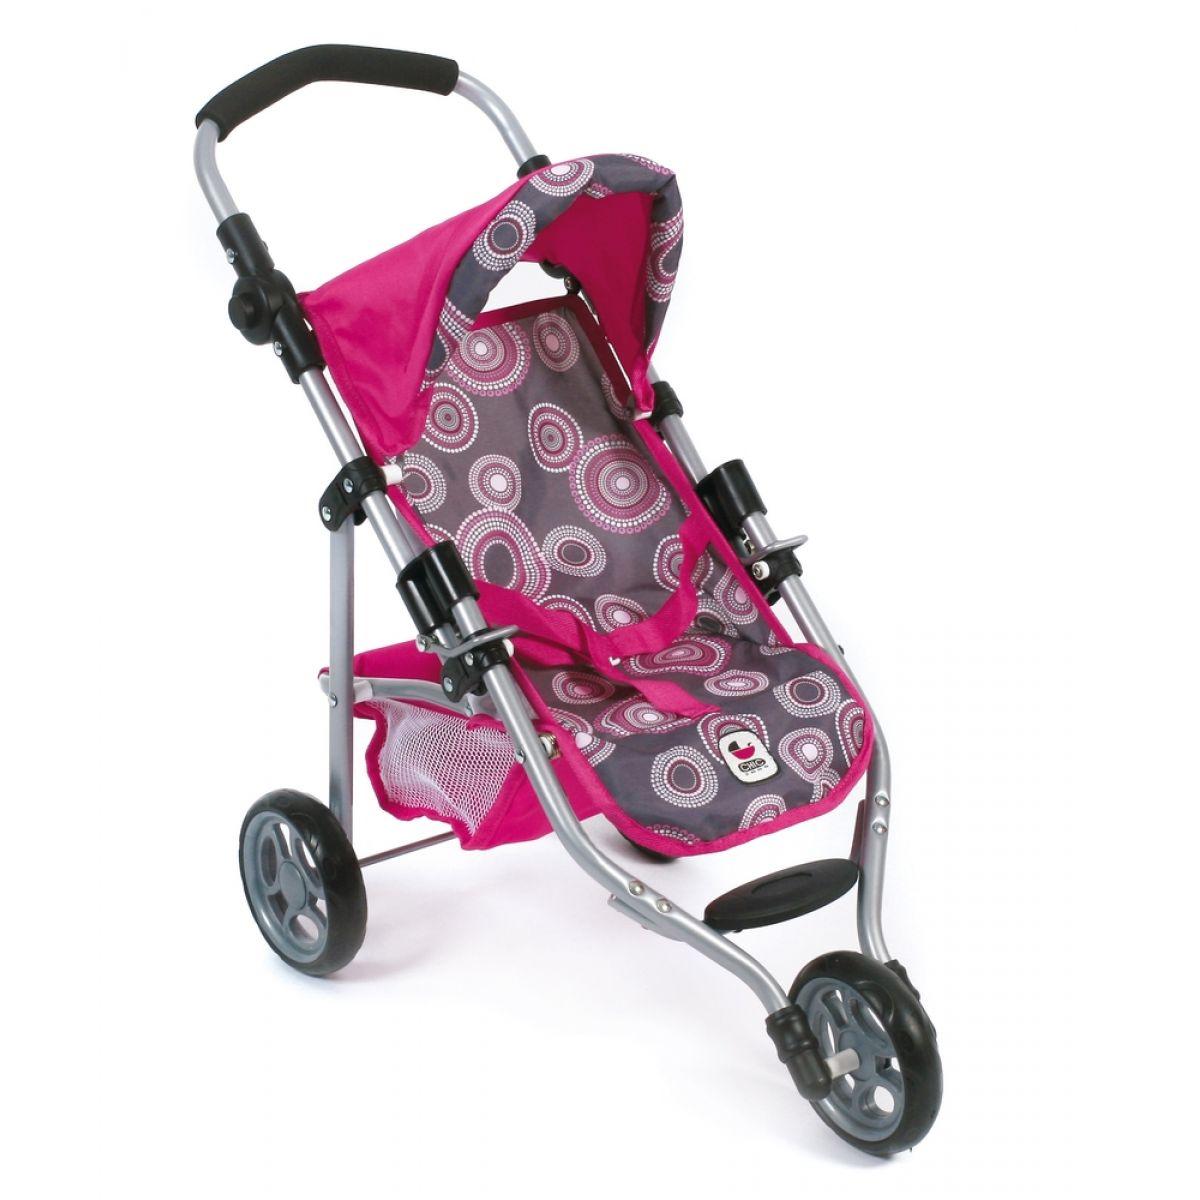 Bayer Chic Kočárek pro panenky Lola - Hot pink pearls